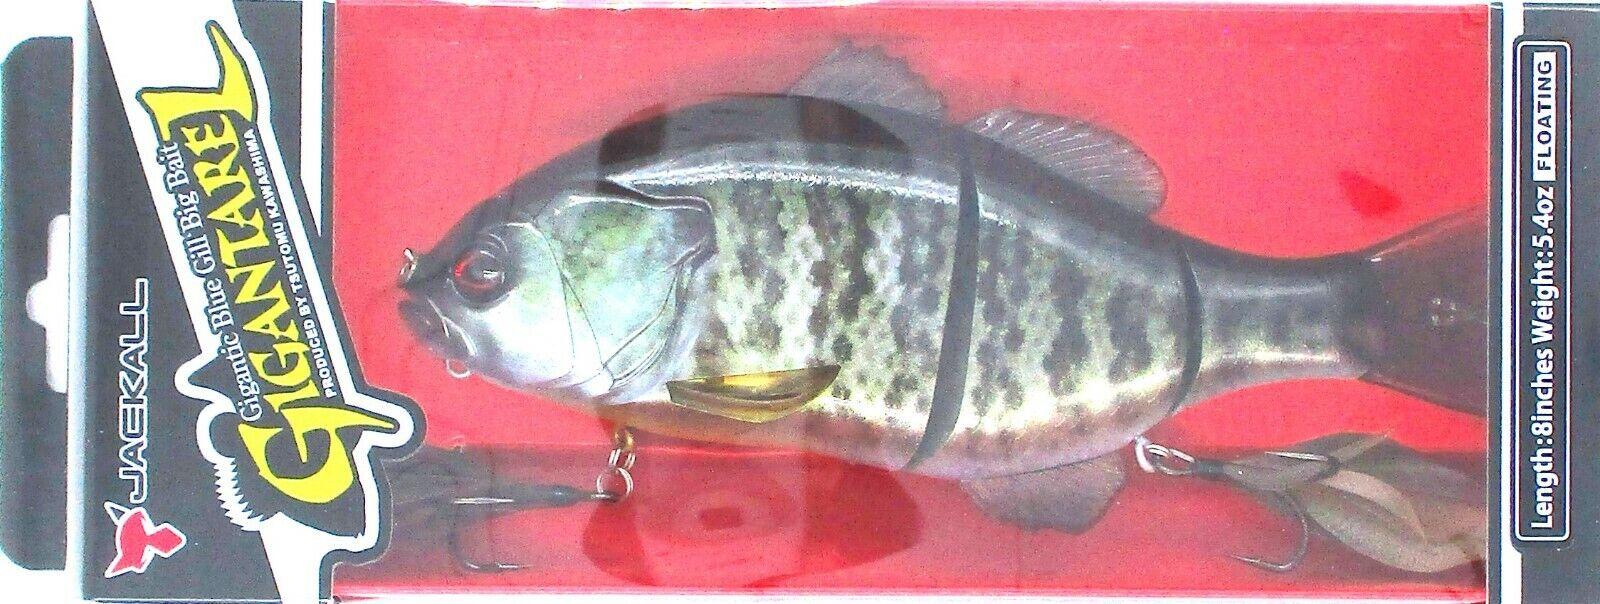 Jackall Gigantarel Hard Body Swimbait Fishing Lures 8 inch Bass Lure BRAND NEW @